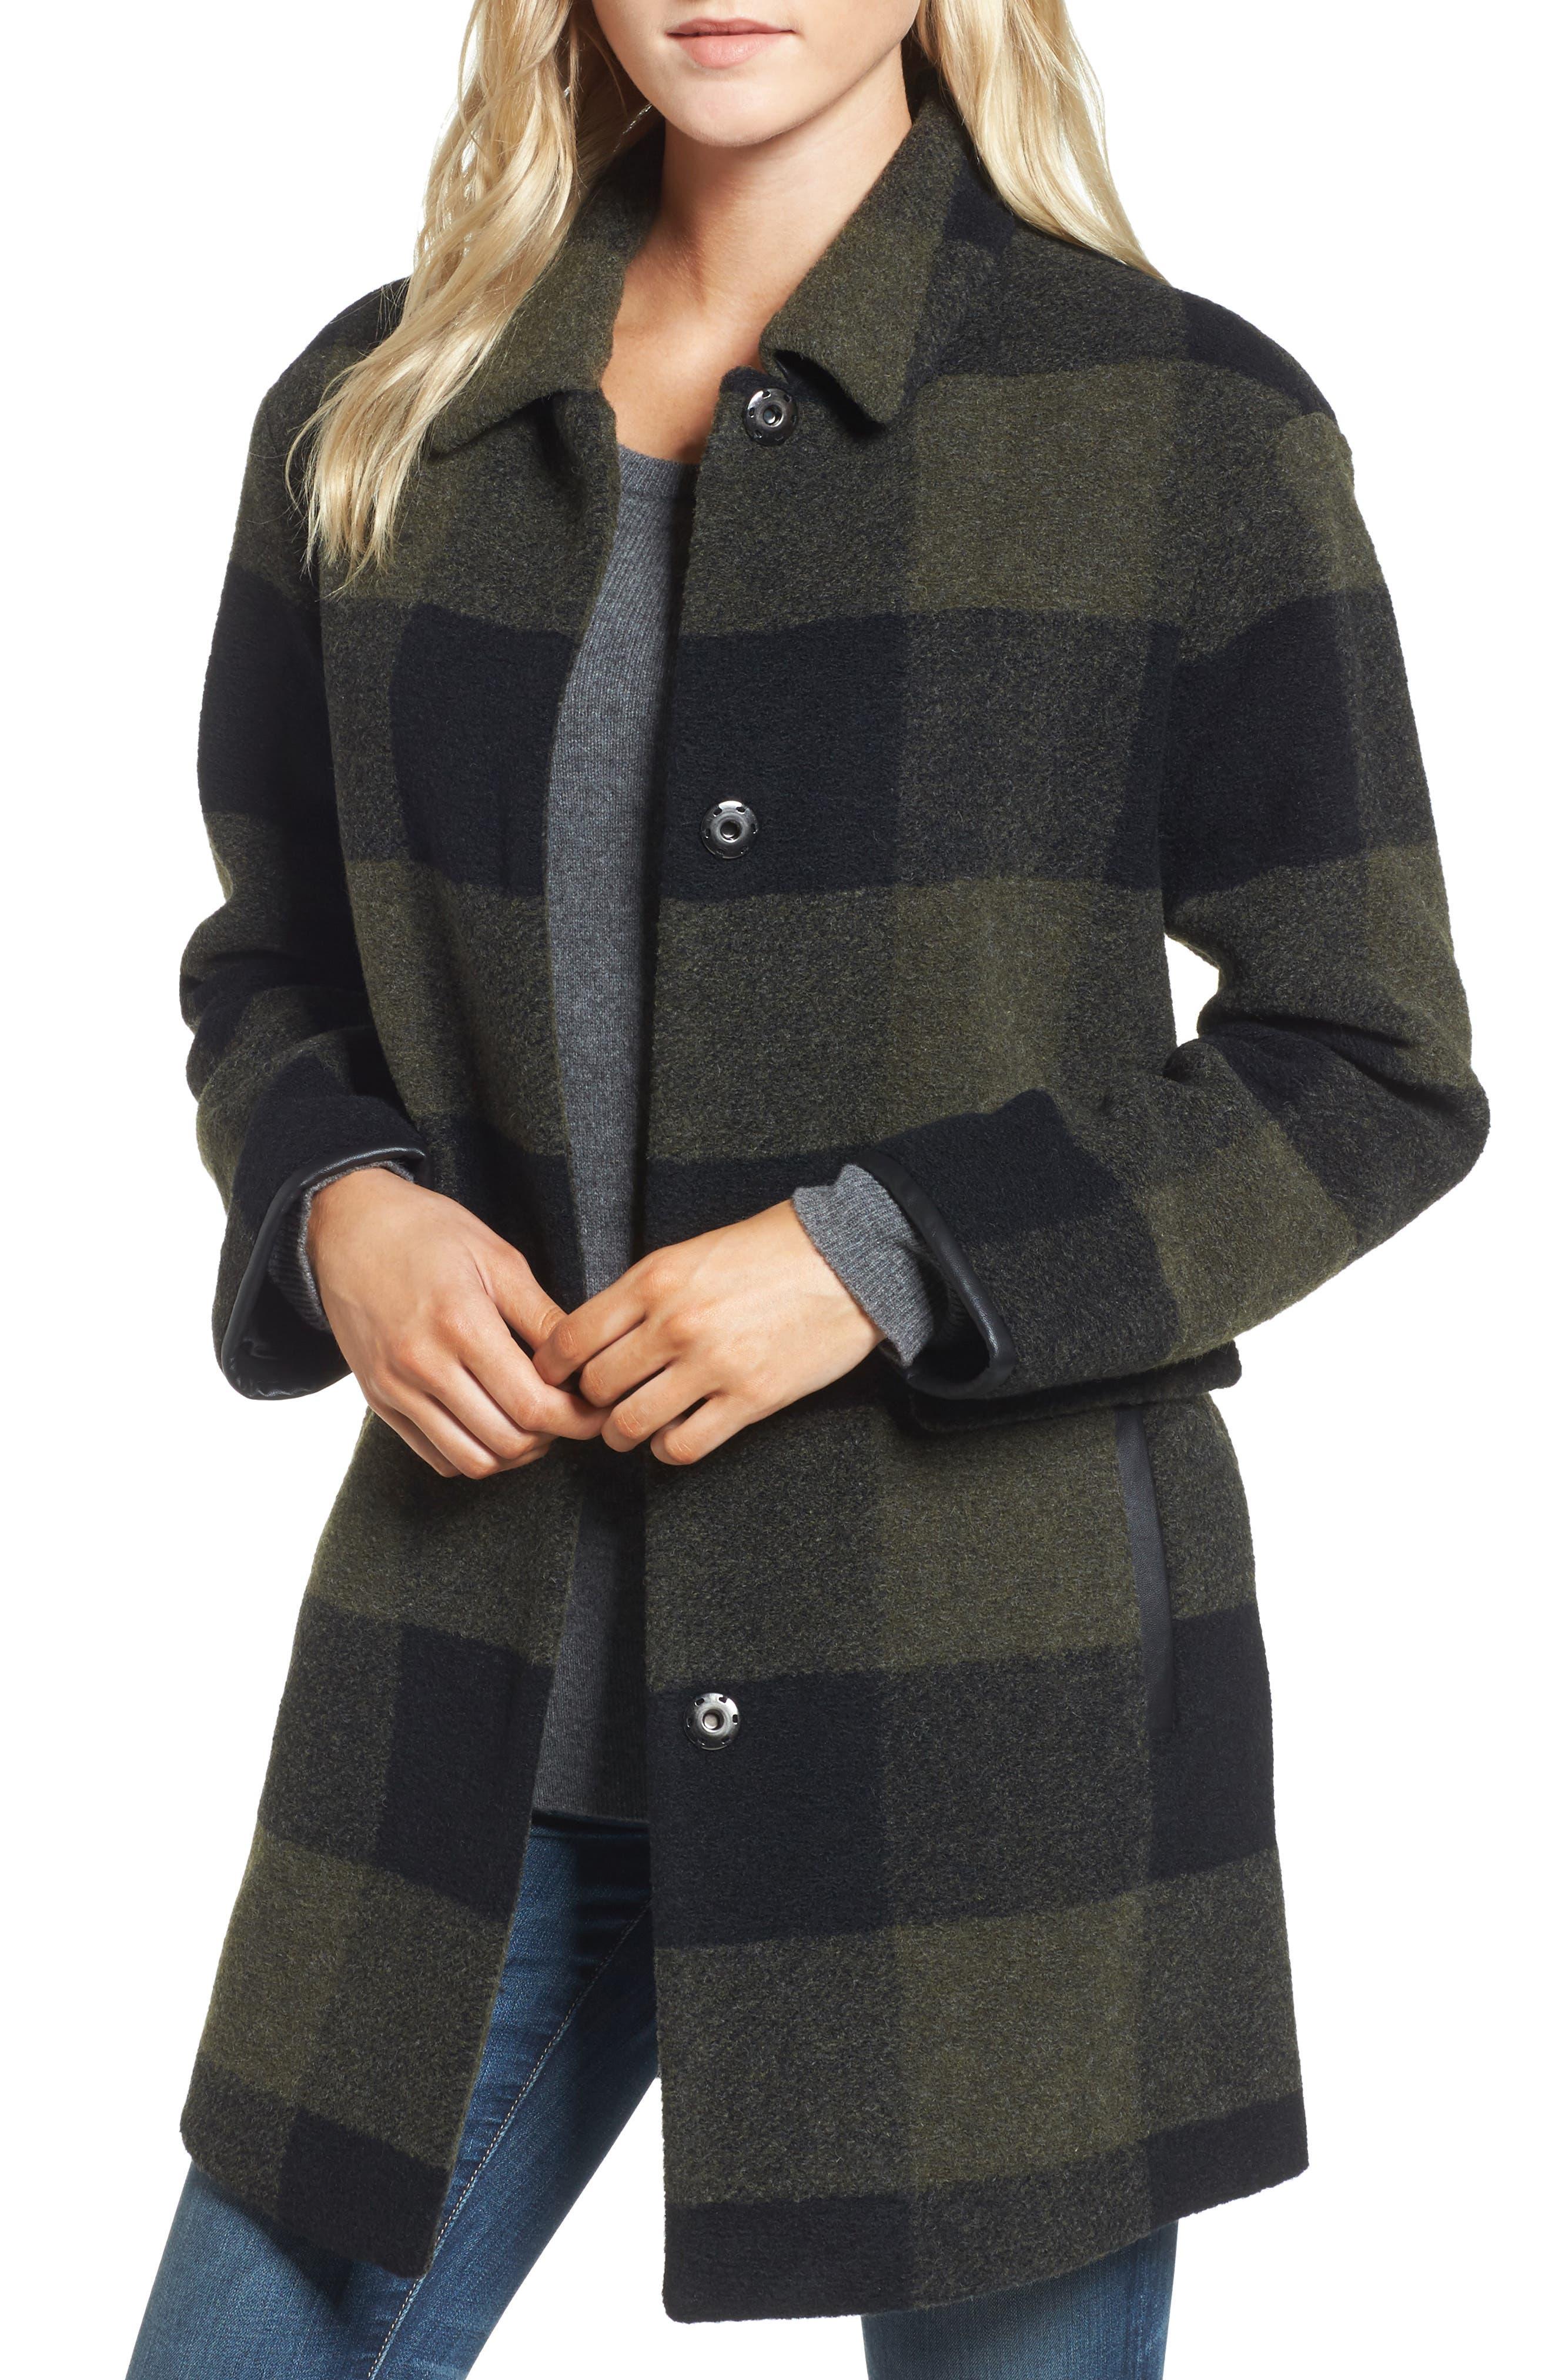 Paul Bunyan Plaid Wool Blend Barn Coat,                             Main thumbnail 1, color,                             Olive/ Black Plaid